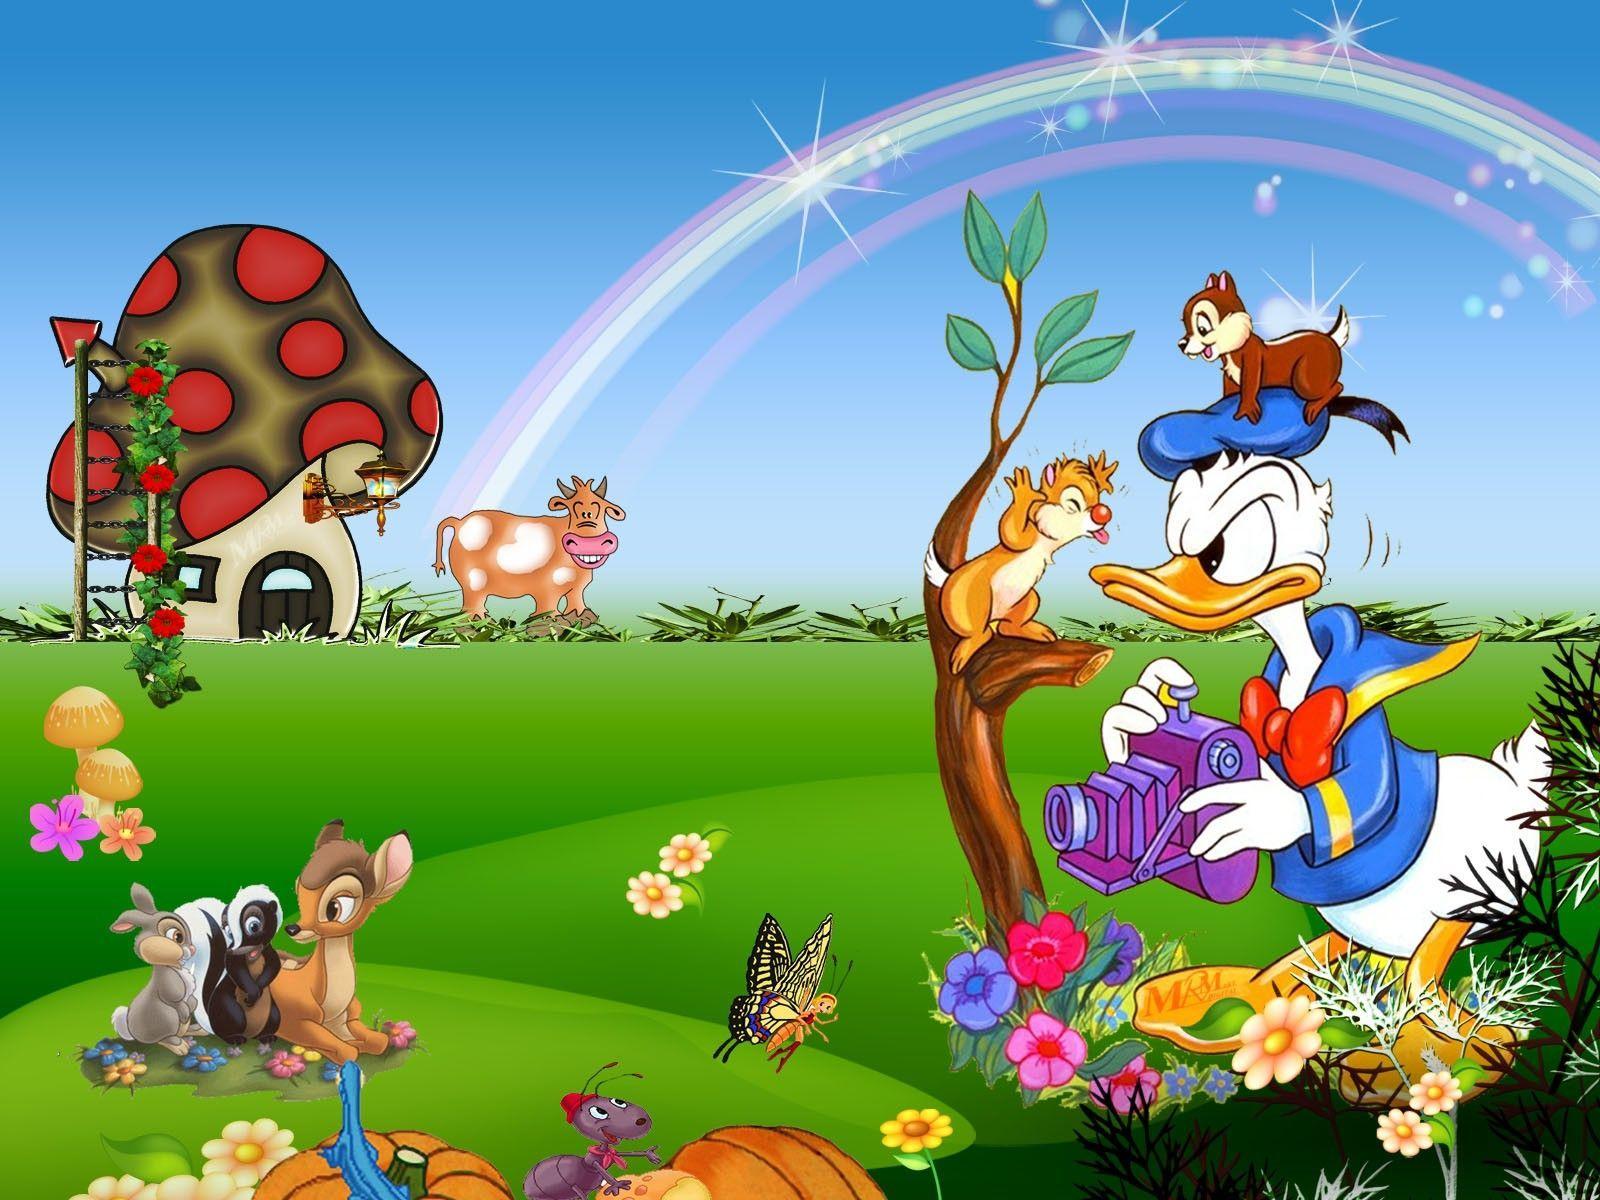 Cartoon Scenery Wallpapers Top Free Cartoon Scenery Backgrounds Wallpaperaccess Cartoon Wallpaper Hd Cartoon Wallpaper Free Cartoon Images